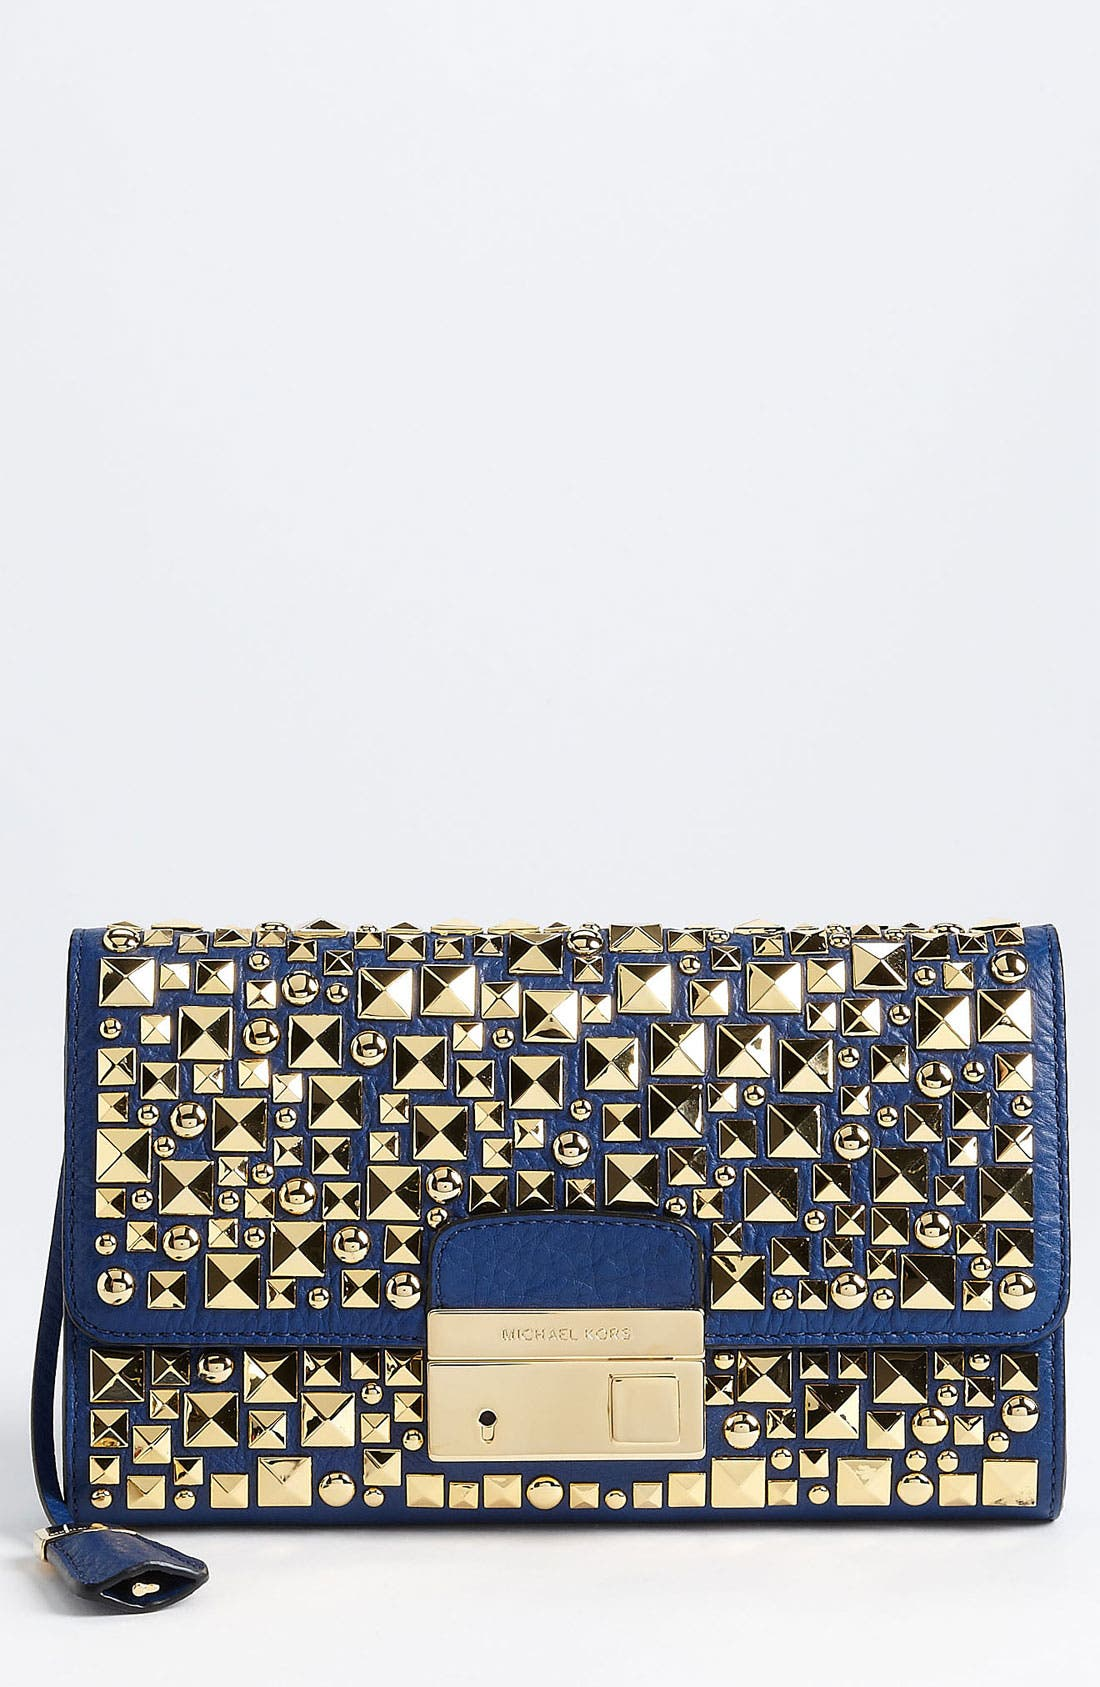 Main Image - Michael Kors 'Gia' Studded Leather Clutch